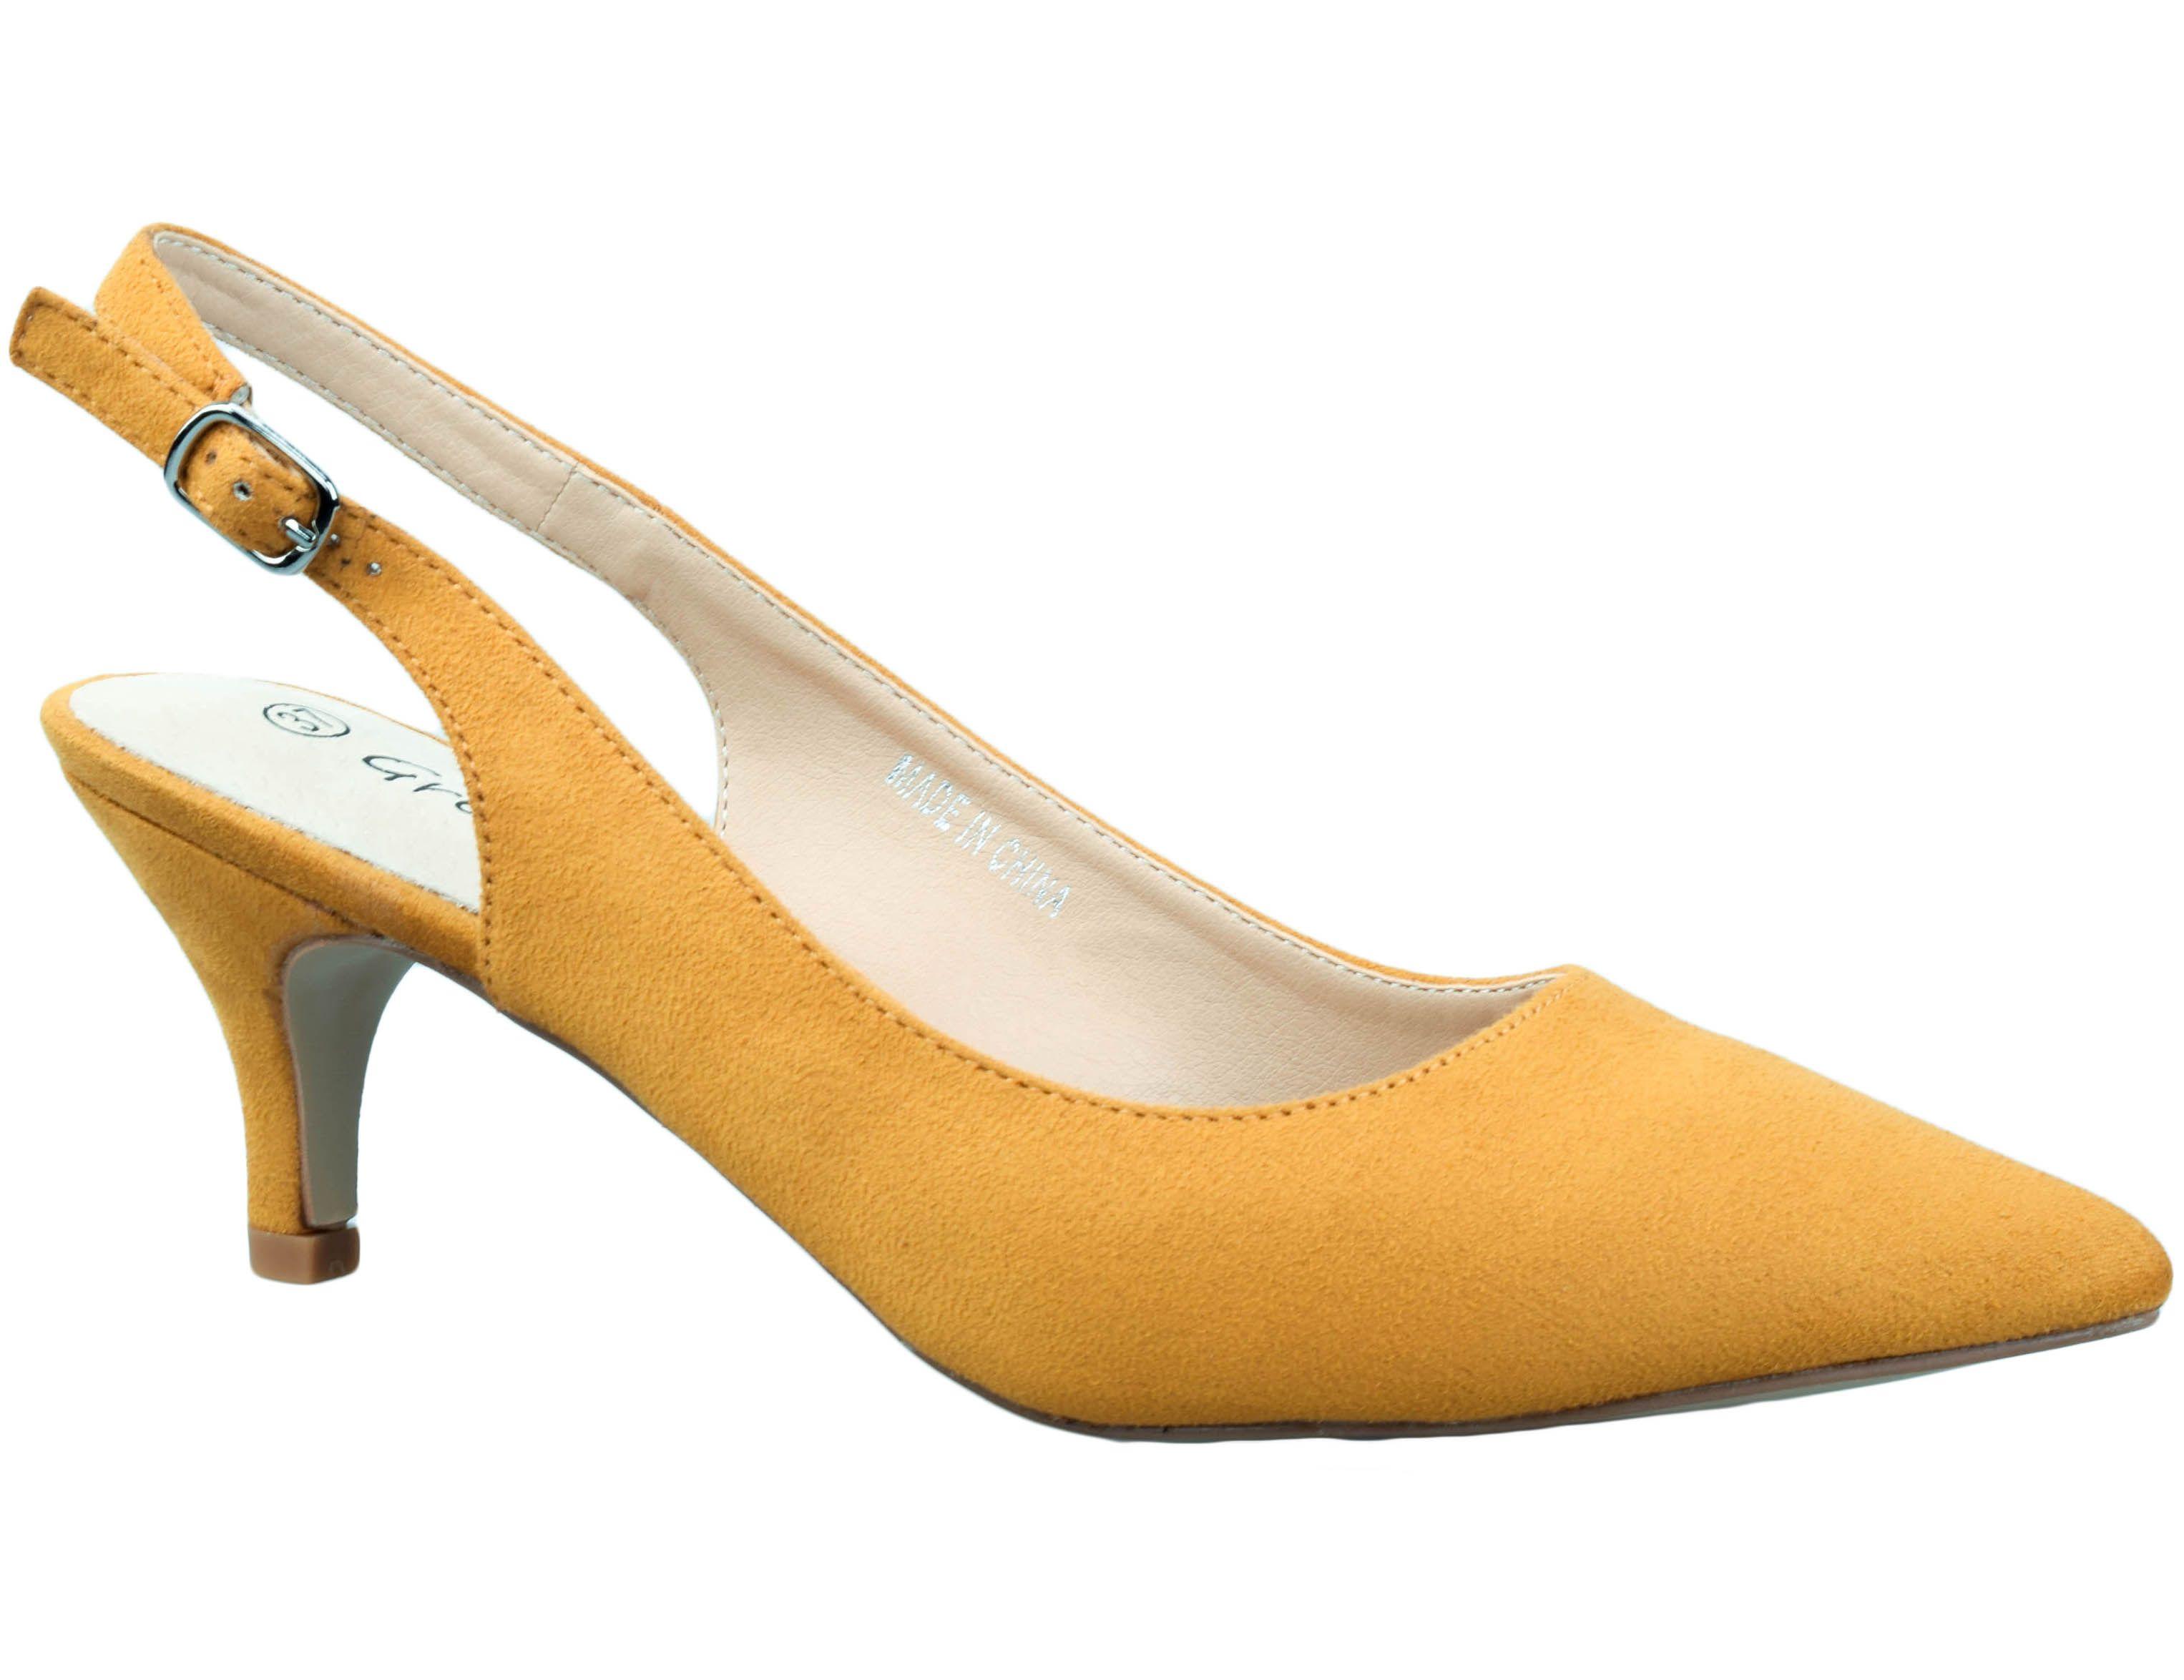 db31b048828 Greatonu Womens Yellow Wedding Sexy Pointed Closed Toe Comfortable  Slingback Pumps